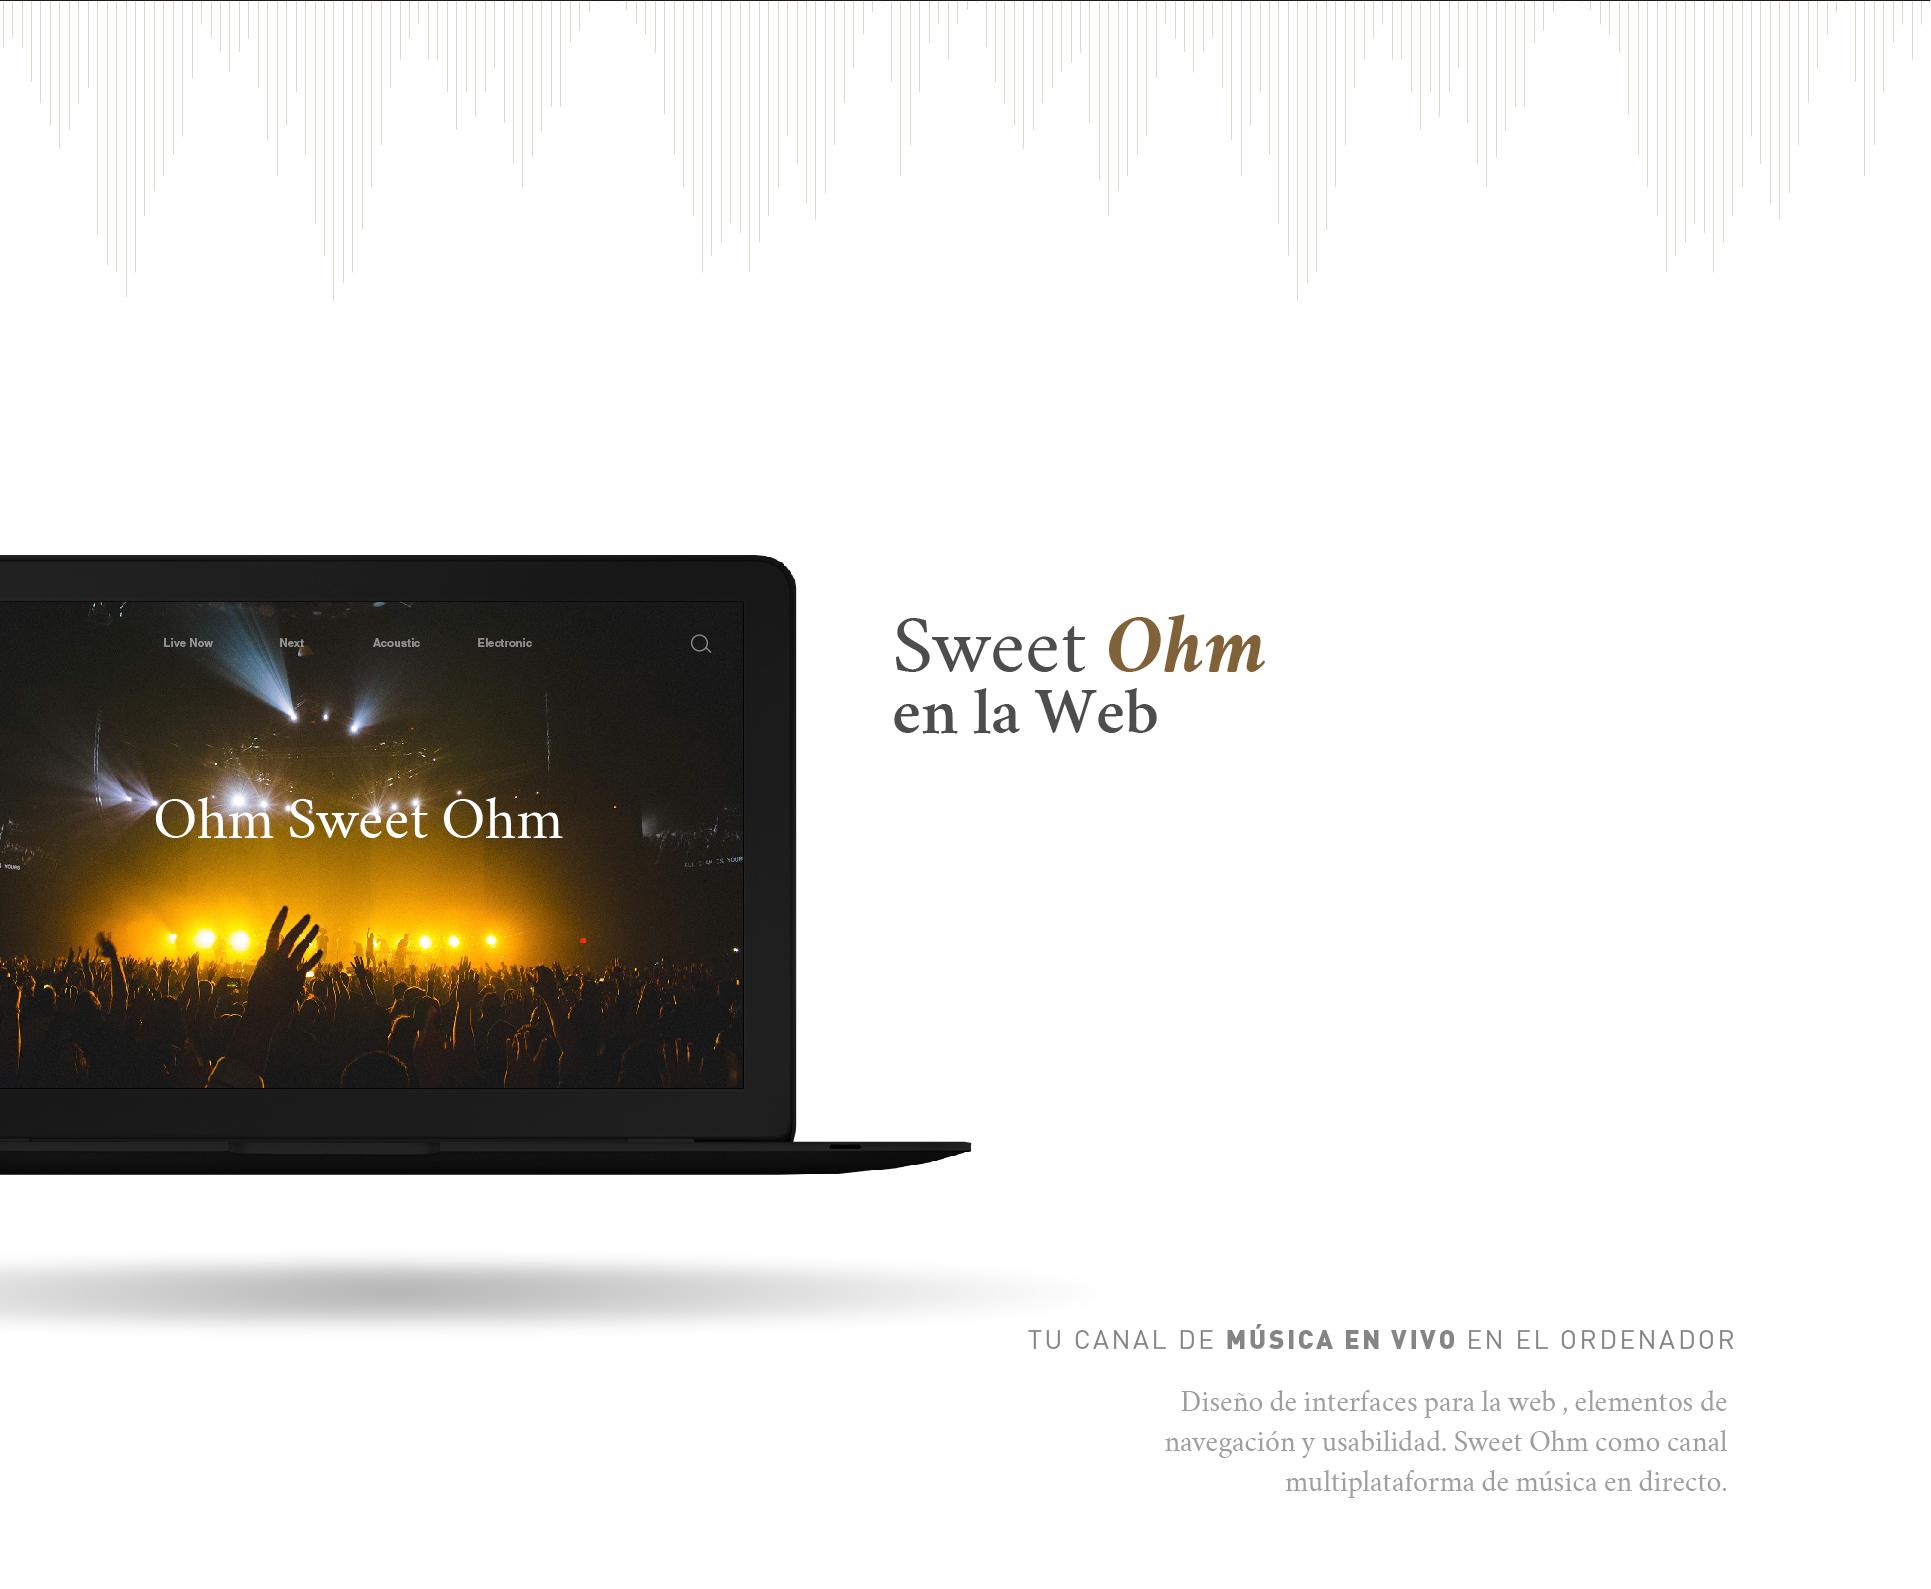 Branding y diseño web para Sweet Ohm por Binarid